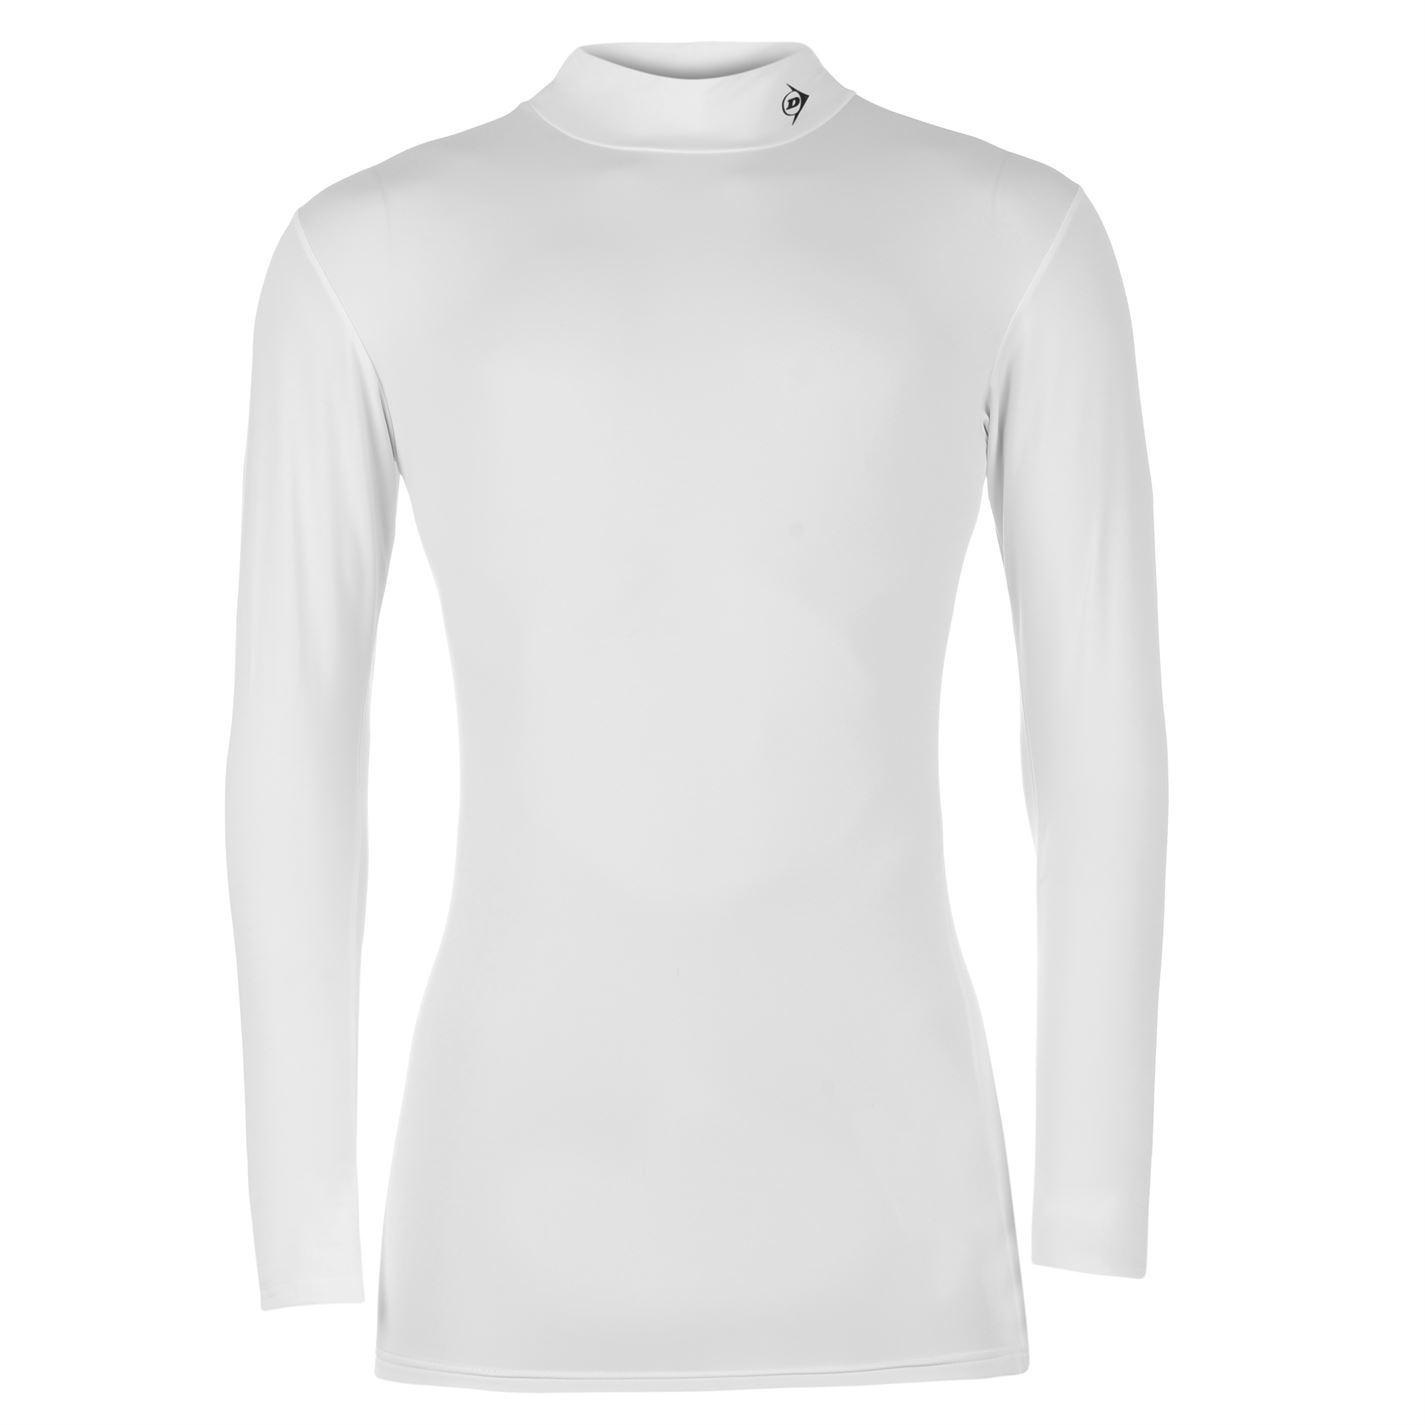 Dunlop mens pro mock shirt golf baselayer tops long sleeve for Mock long sleeve t shirts